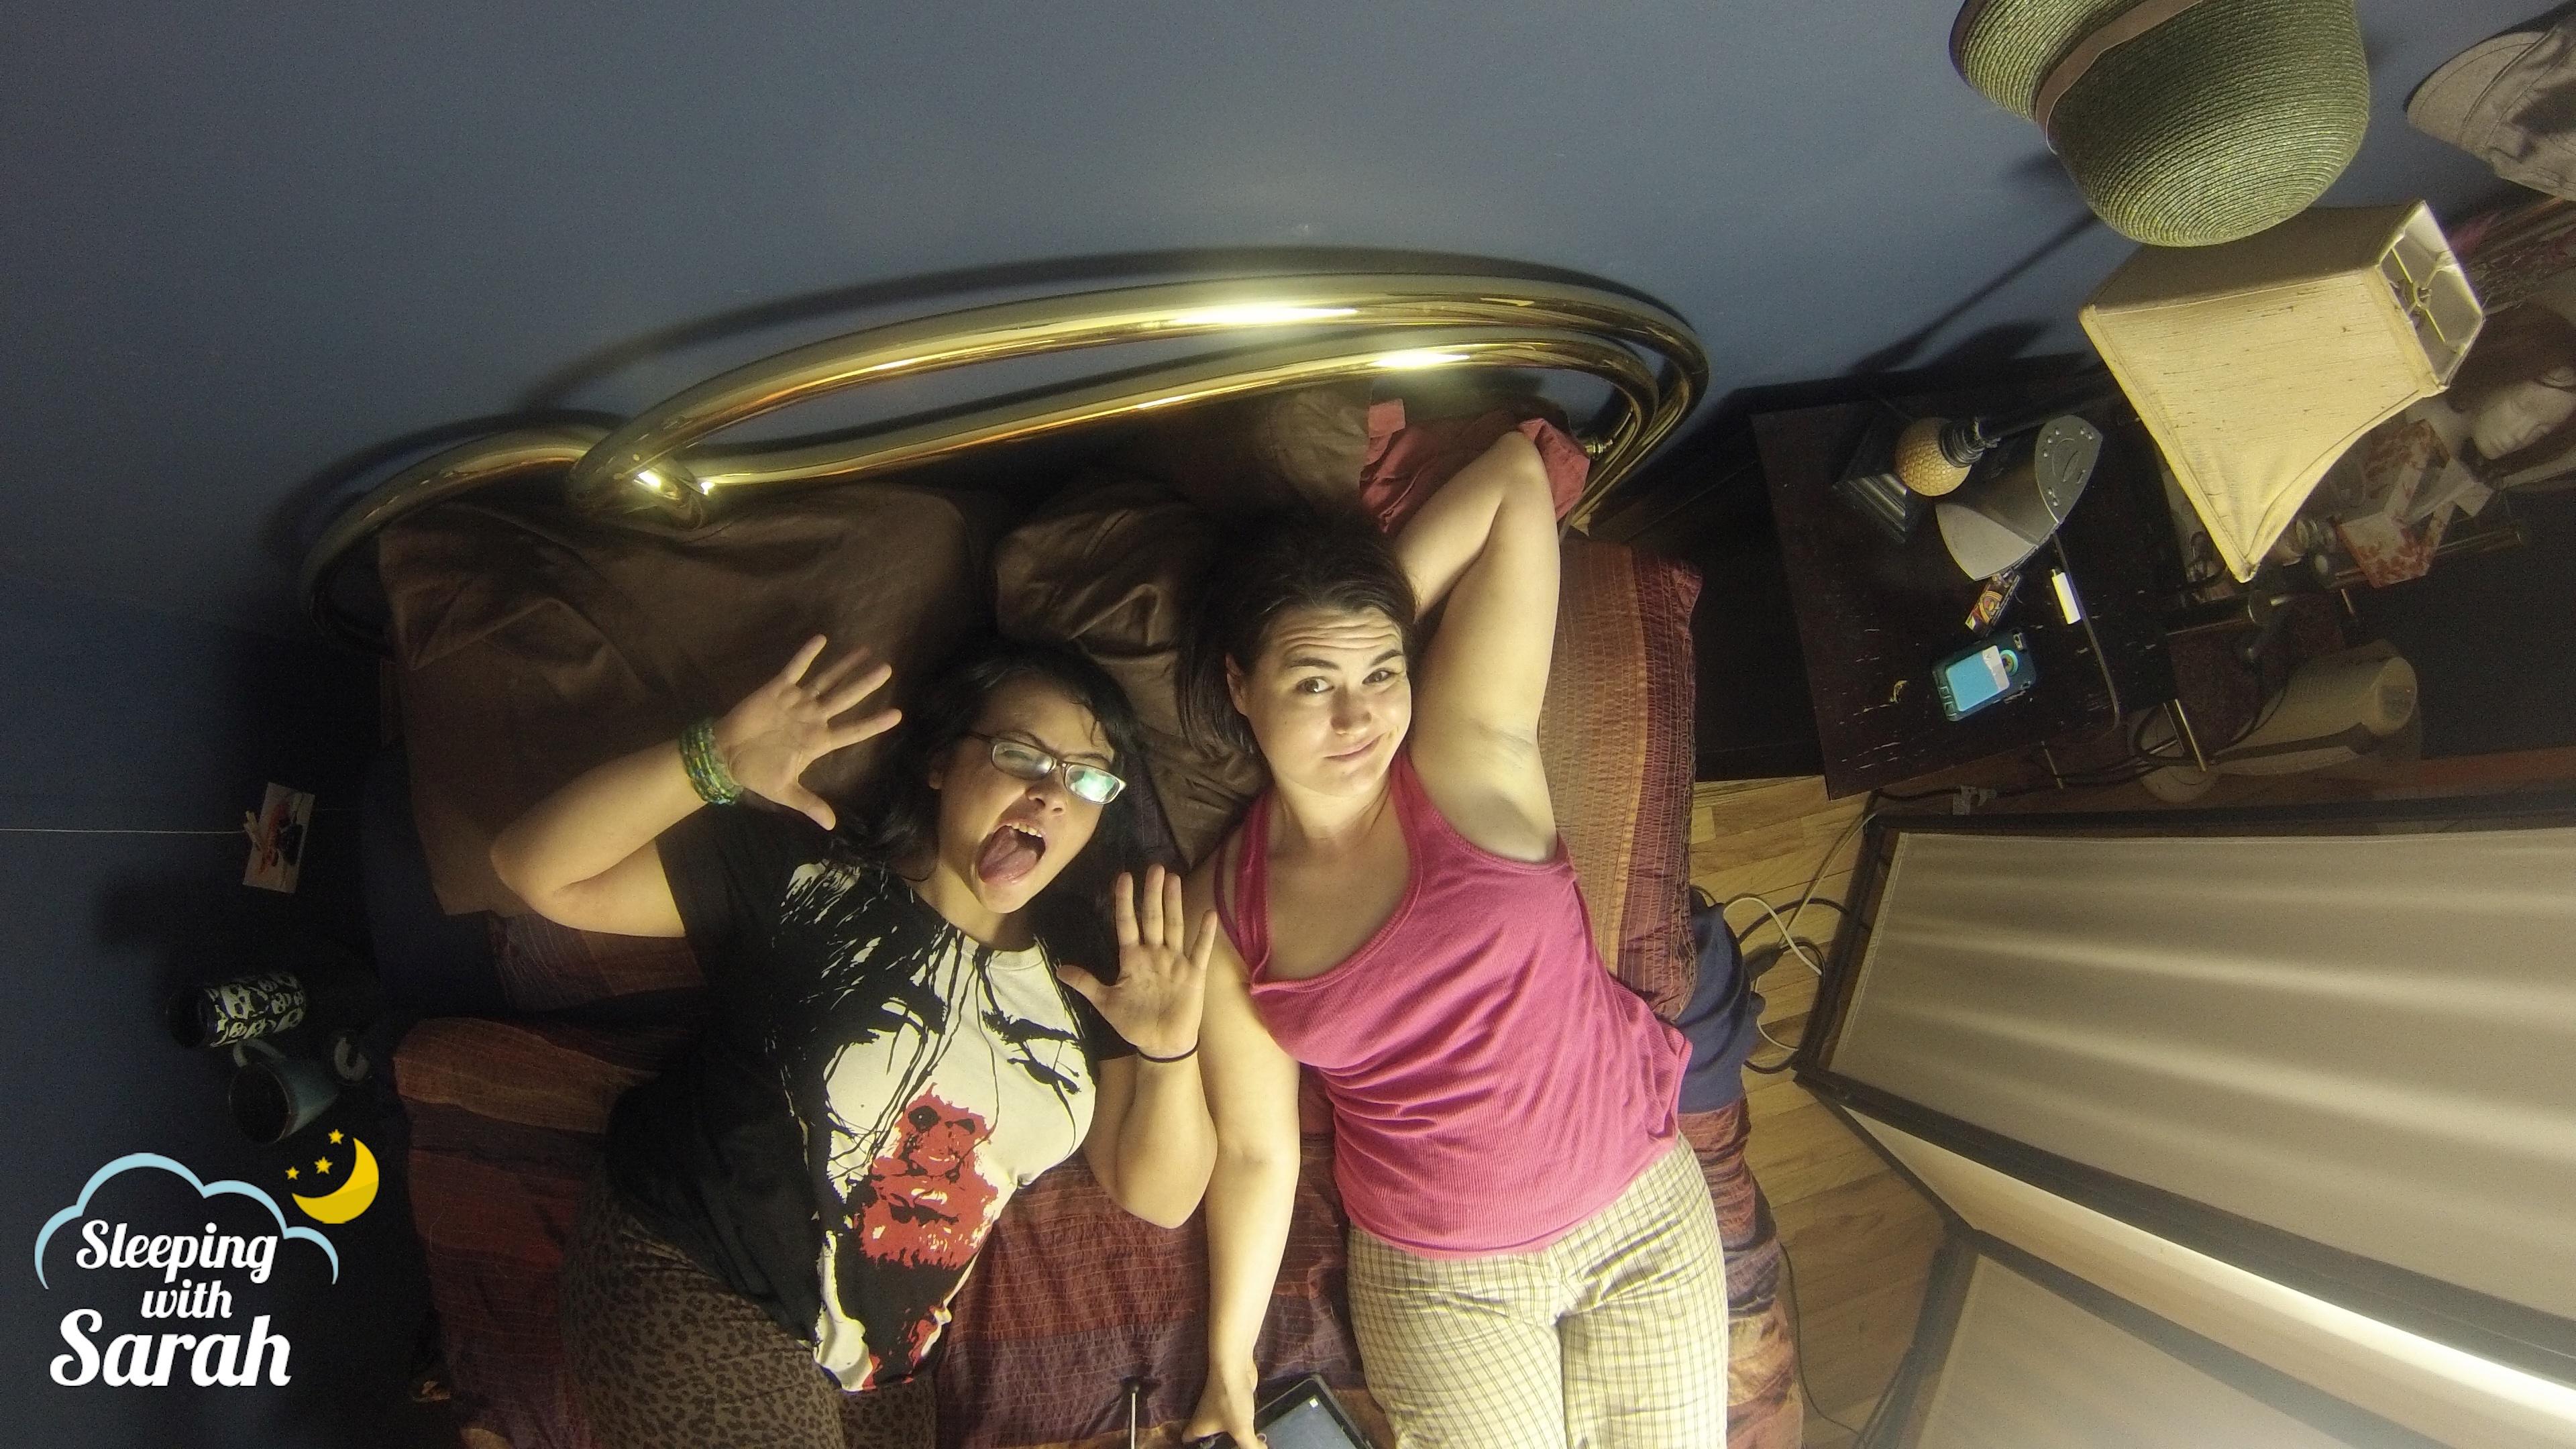 Sleeping with Sarah: Ep 24: Sleep Paralysis, Ghosts and Lucid Dreams